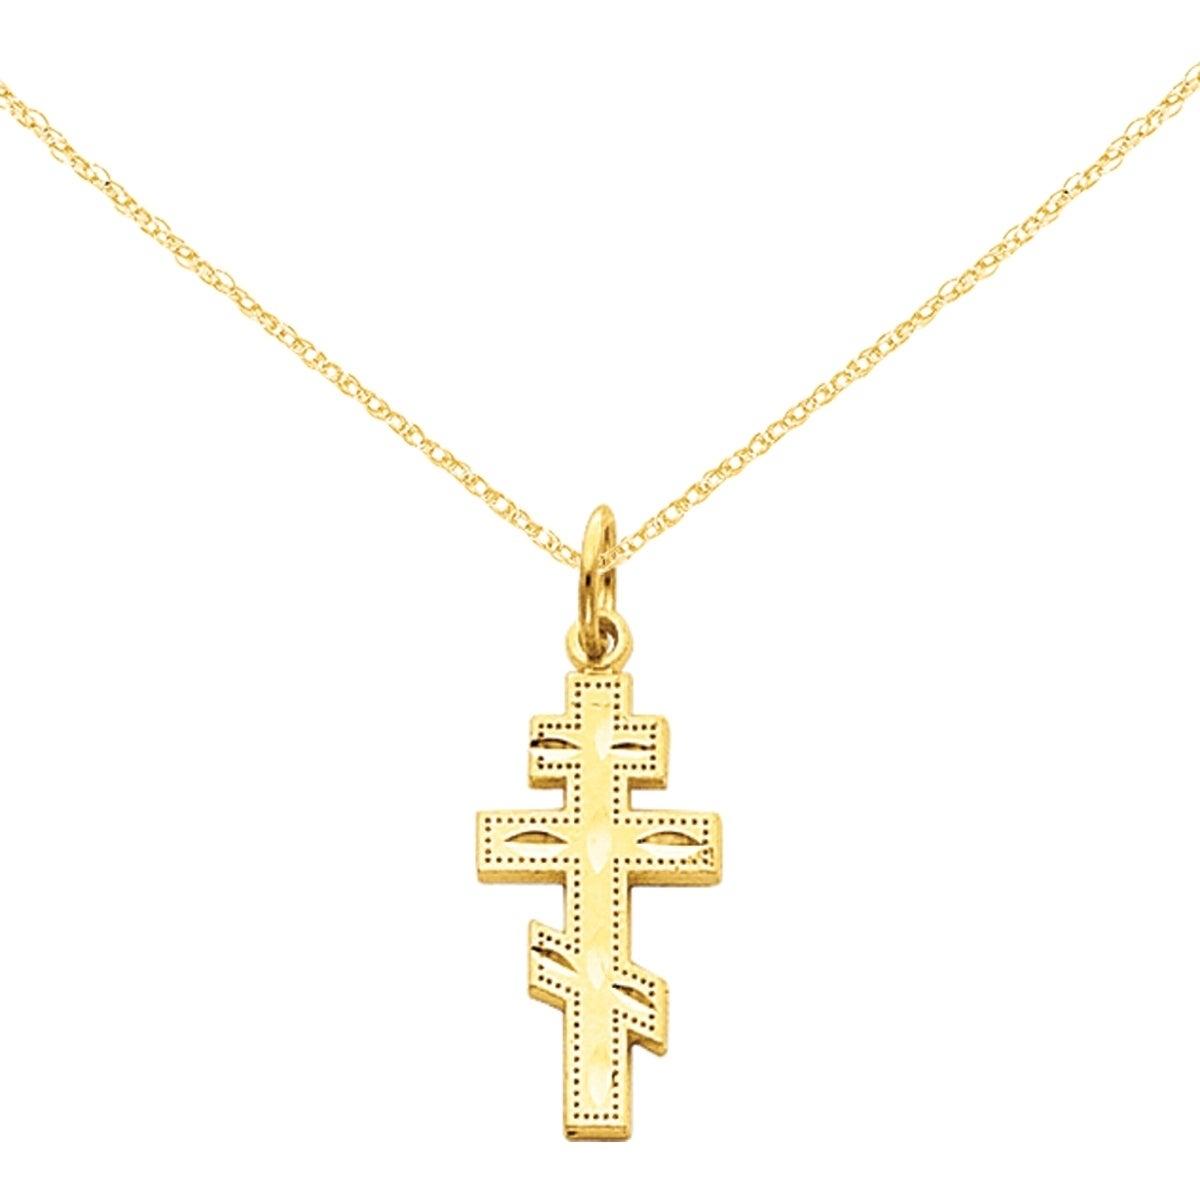 14K Yellow Gold Mini Eastern Orthodox Cross Charm Pendant